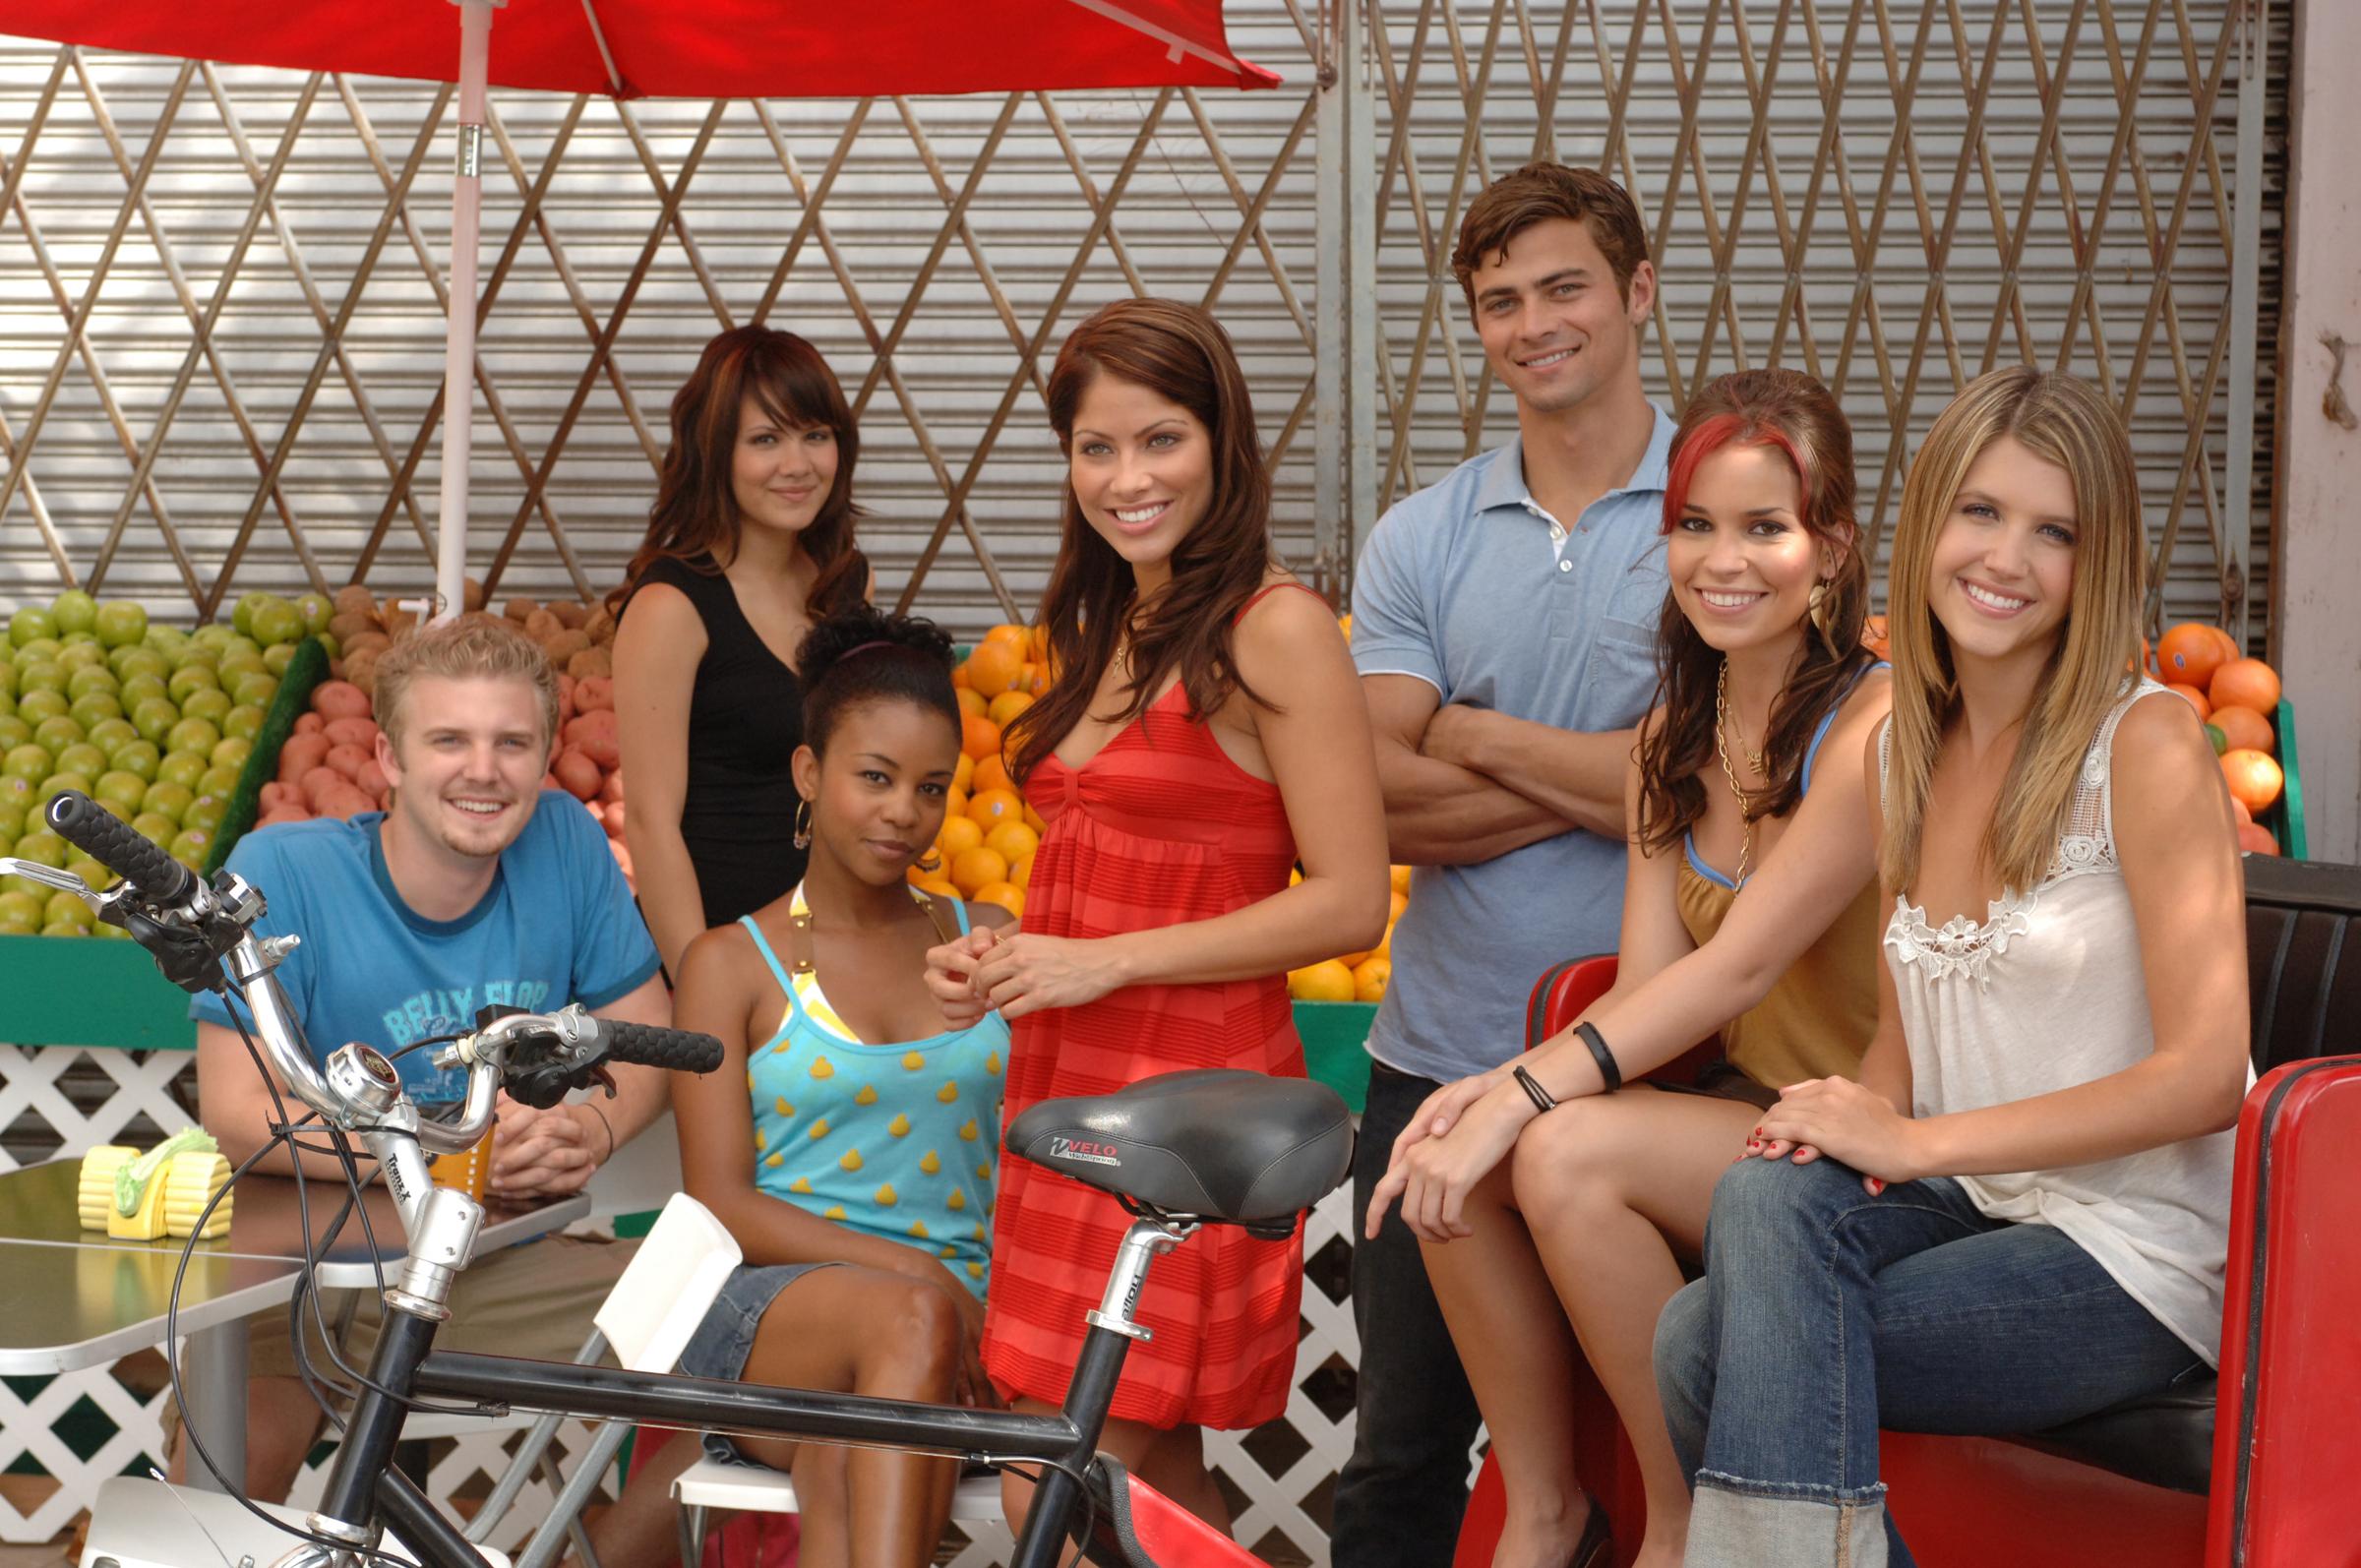 Still of Eileen April Boylan, Valery M. Ortiz, Aasha Davis, Gabrielle Christian, Mandy Musgrave, Matt Cohen and Chris Hunter in South of Nowhere (2005)